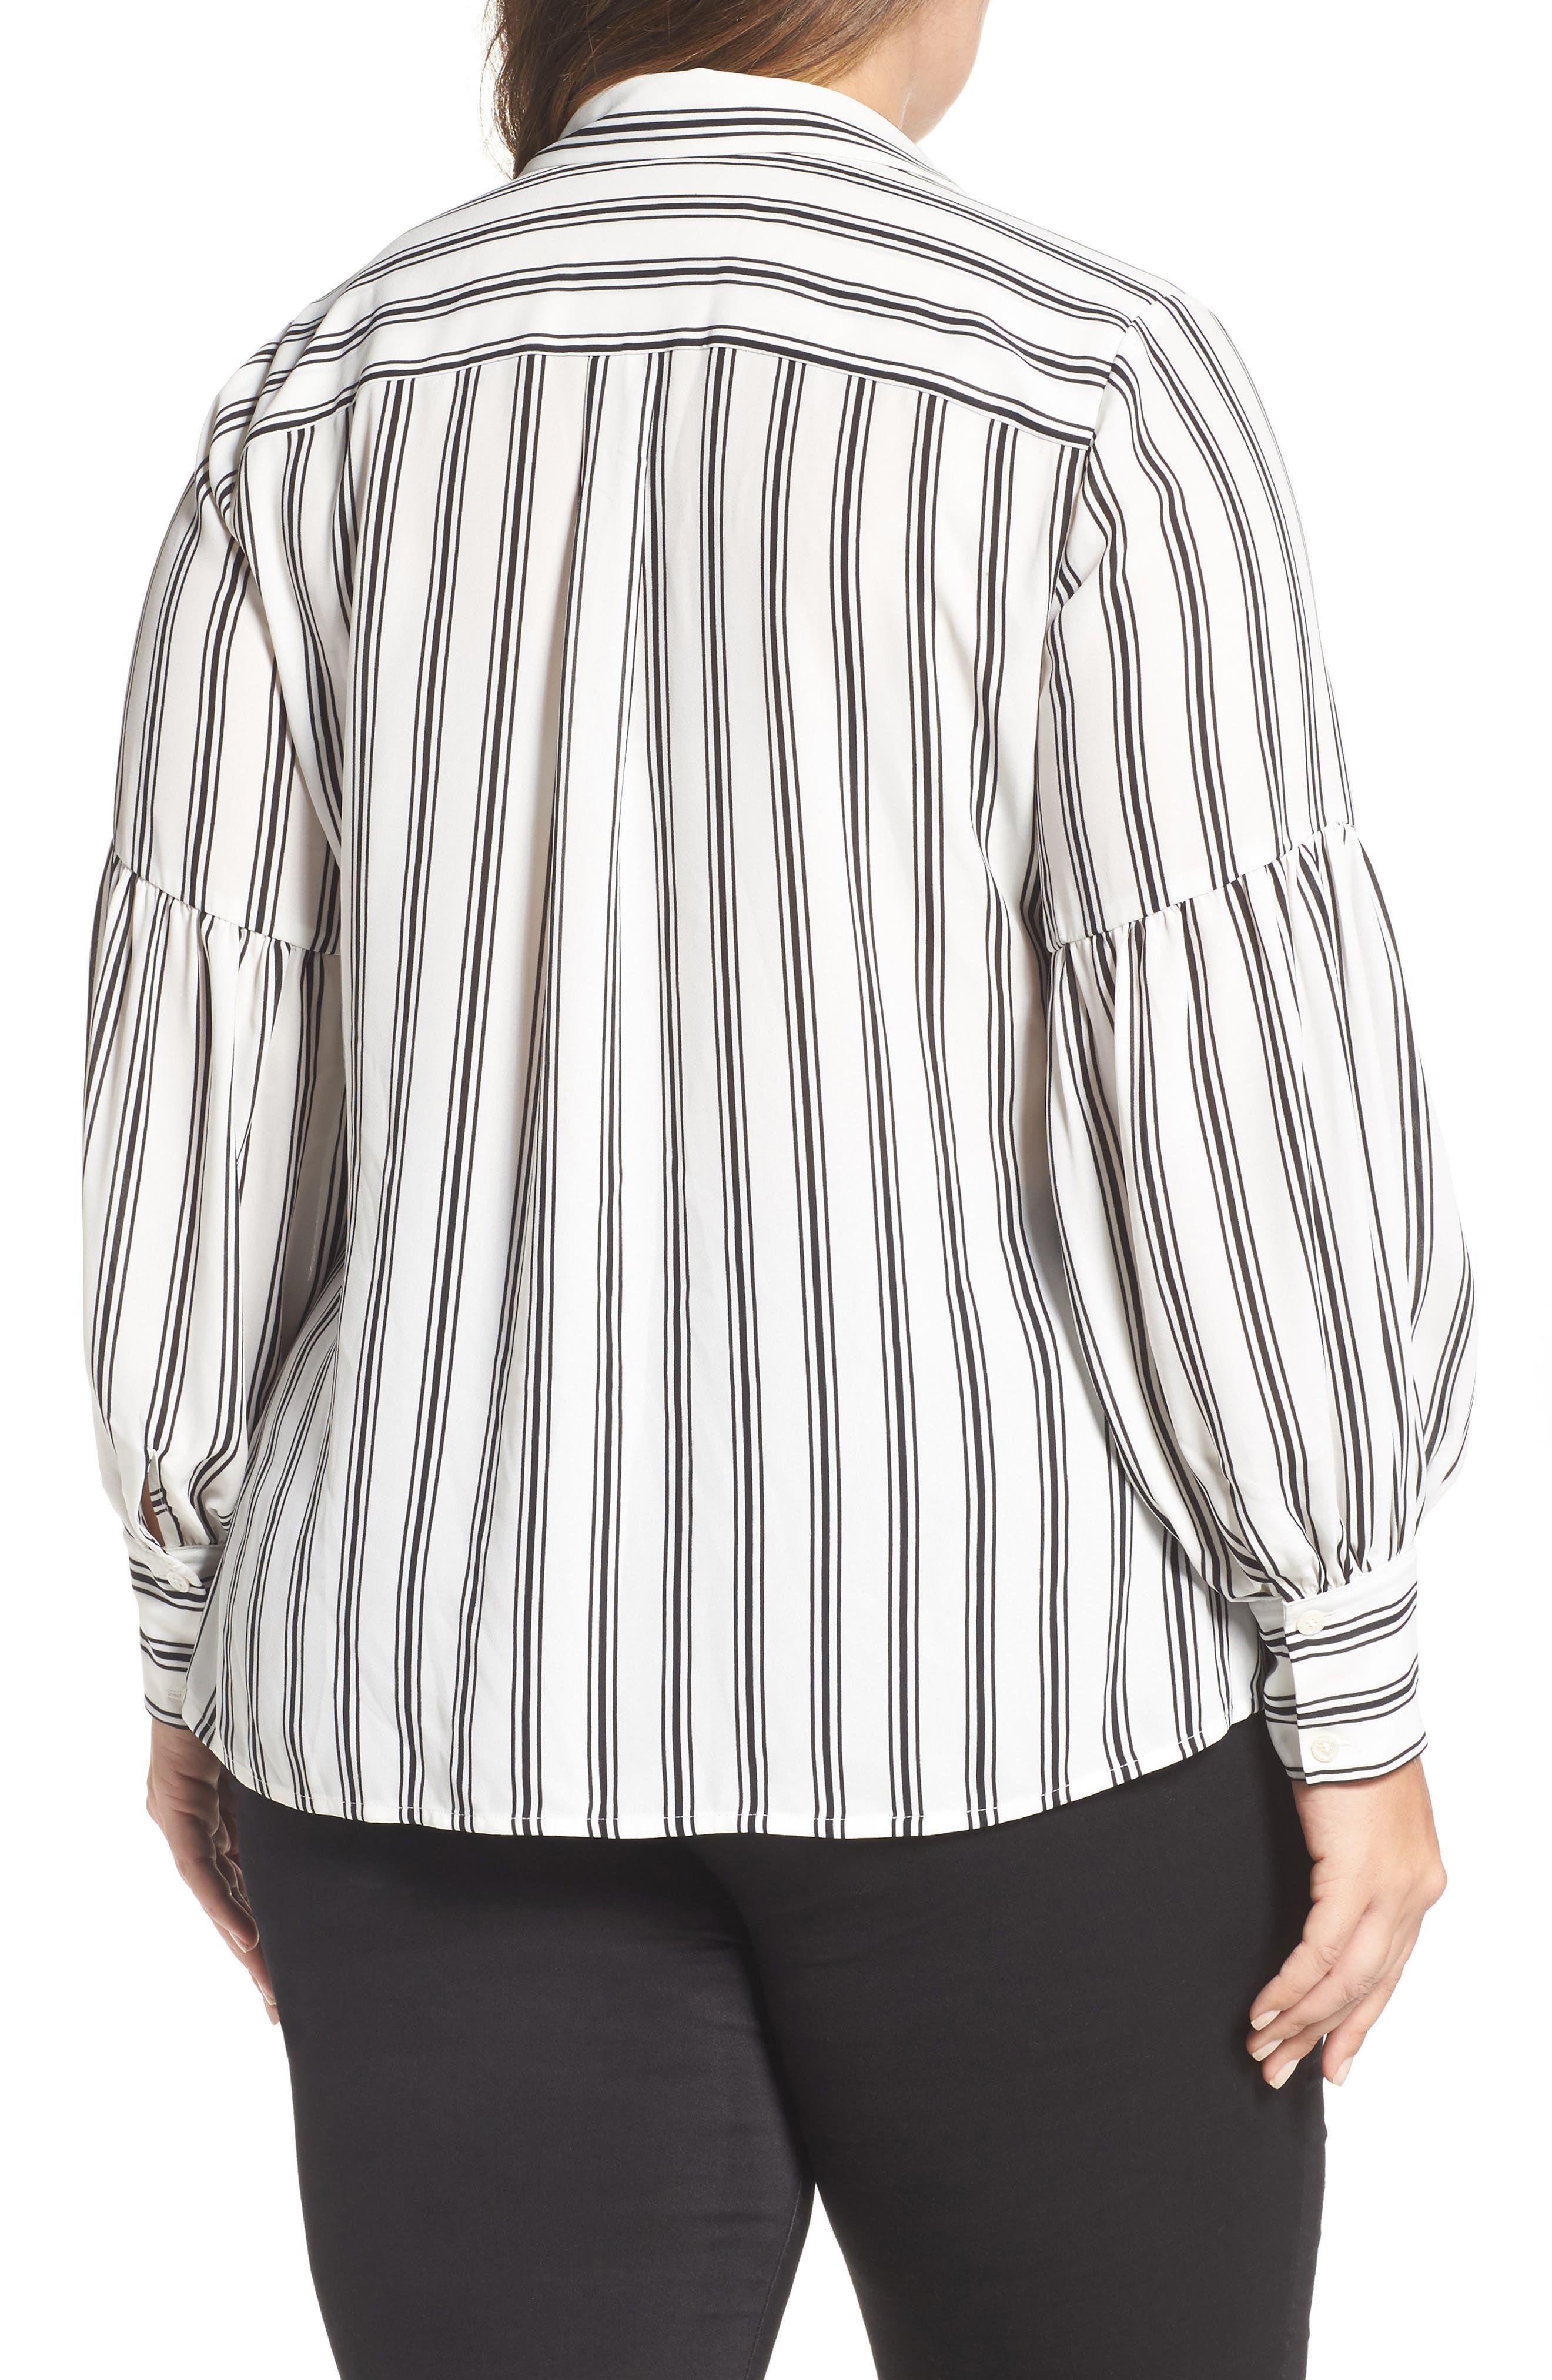 Stripe Puff Sleeve Blouse,                             Alternate thumbnail 2, color,                             901